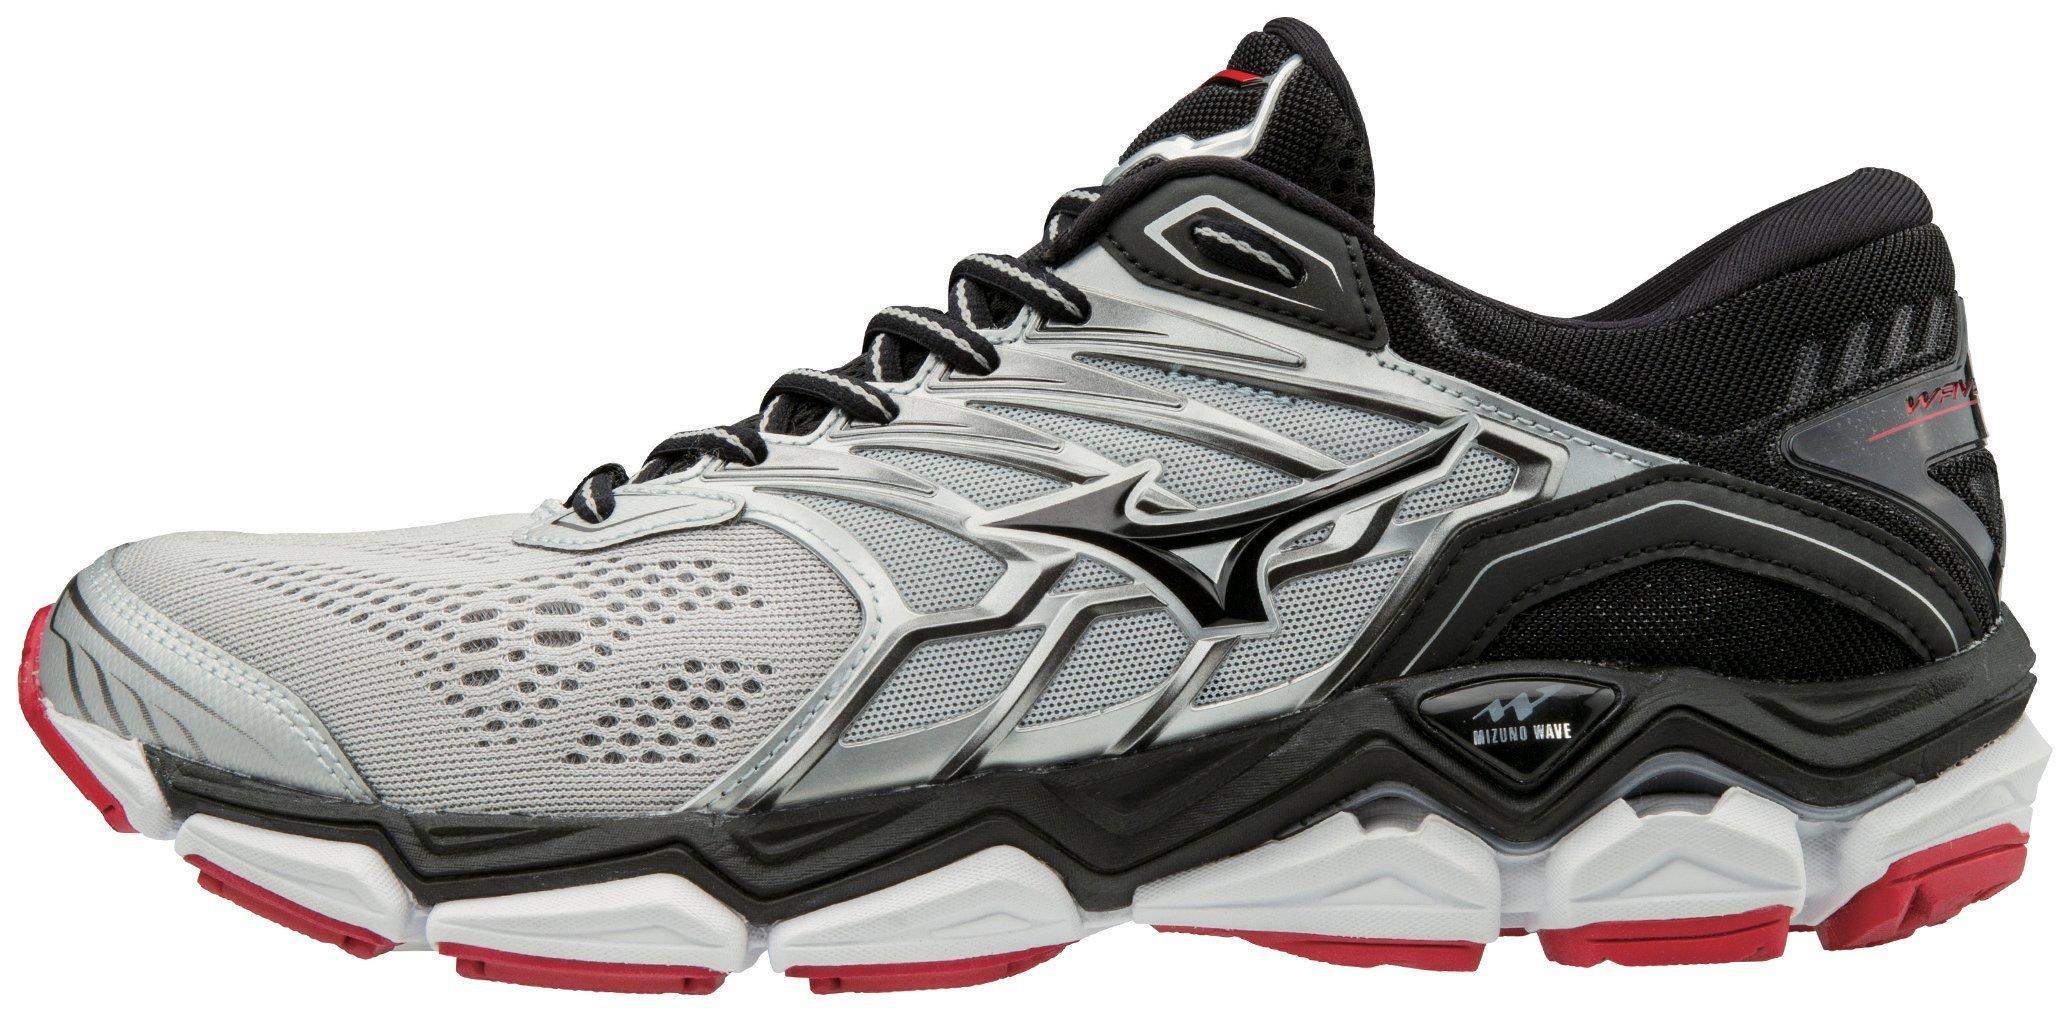 Mizuno Mens Running Shoes - Men's Wave Horizon 2 Running Shoe - 410981